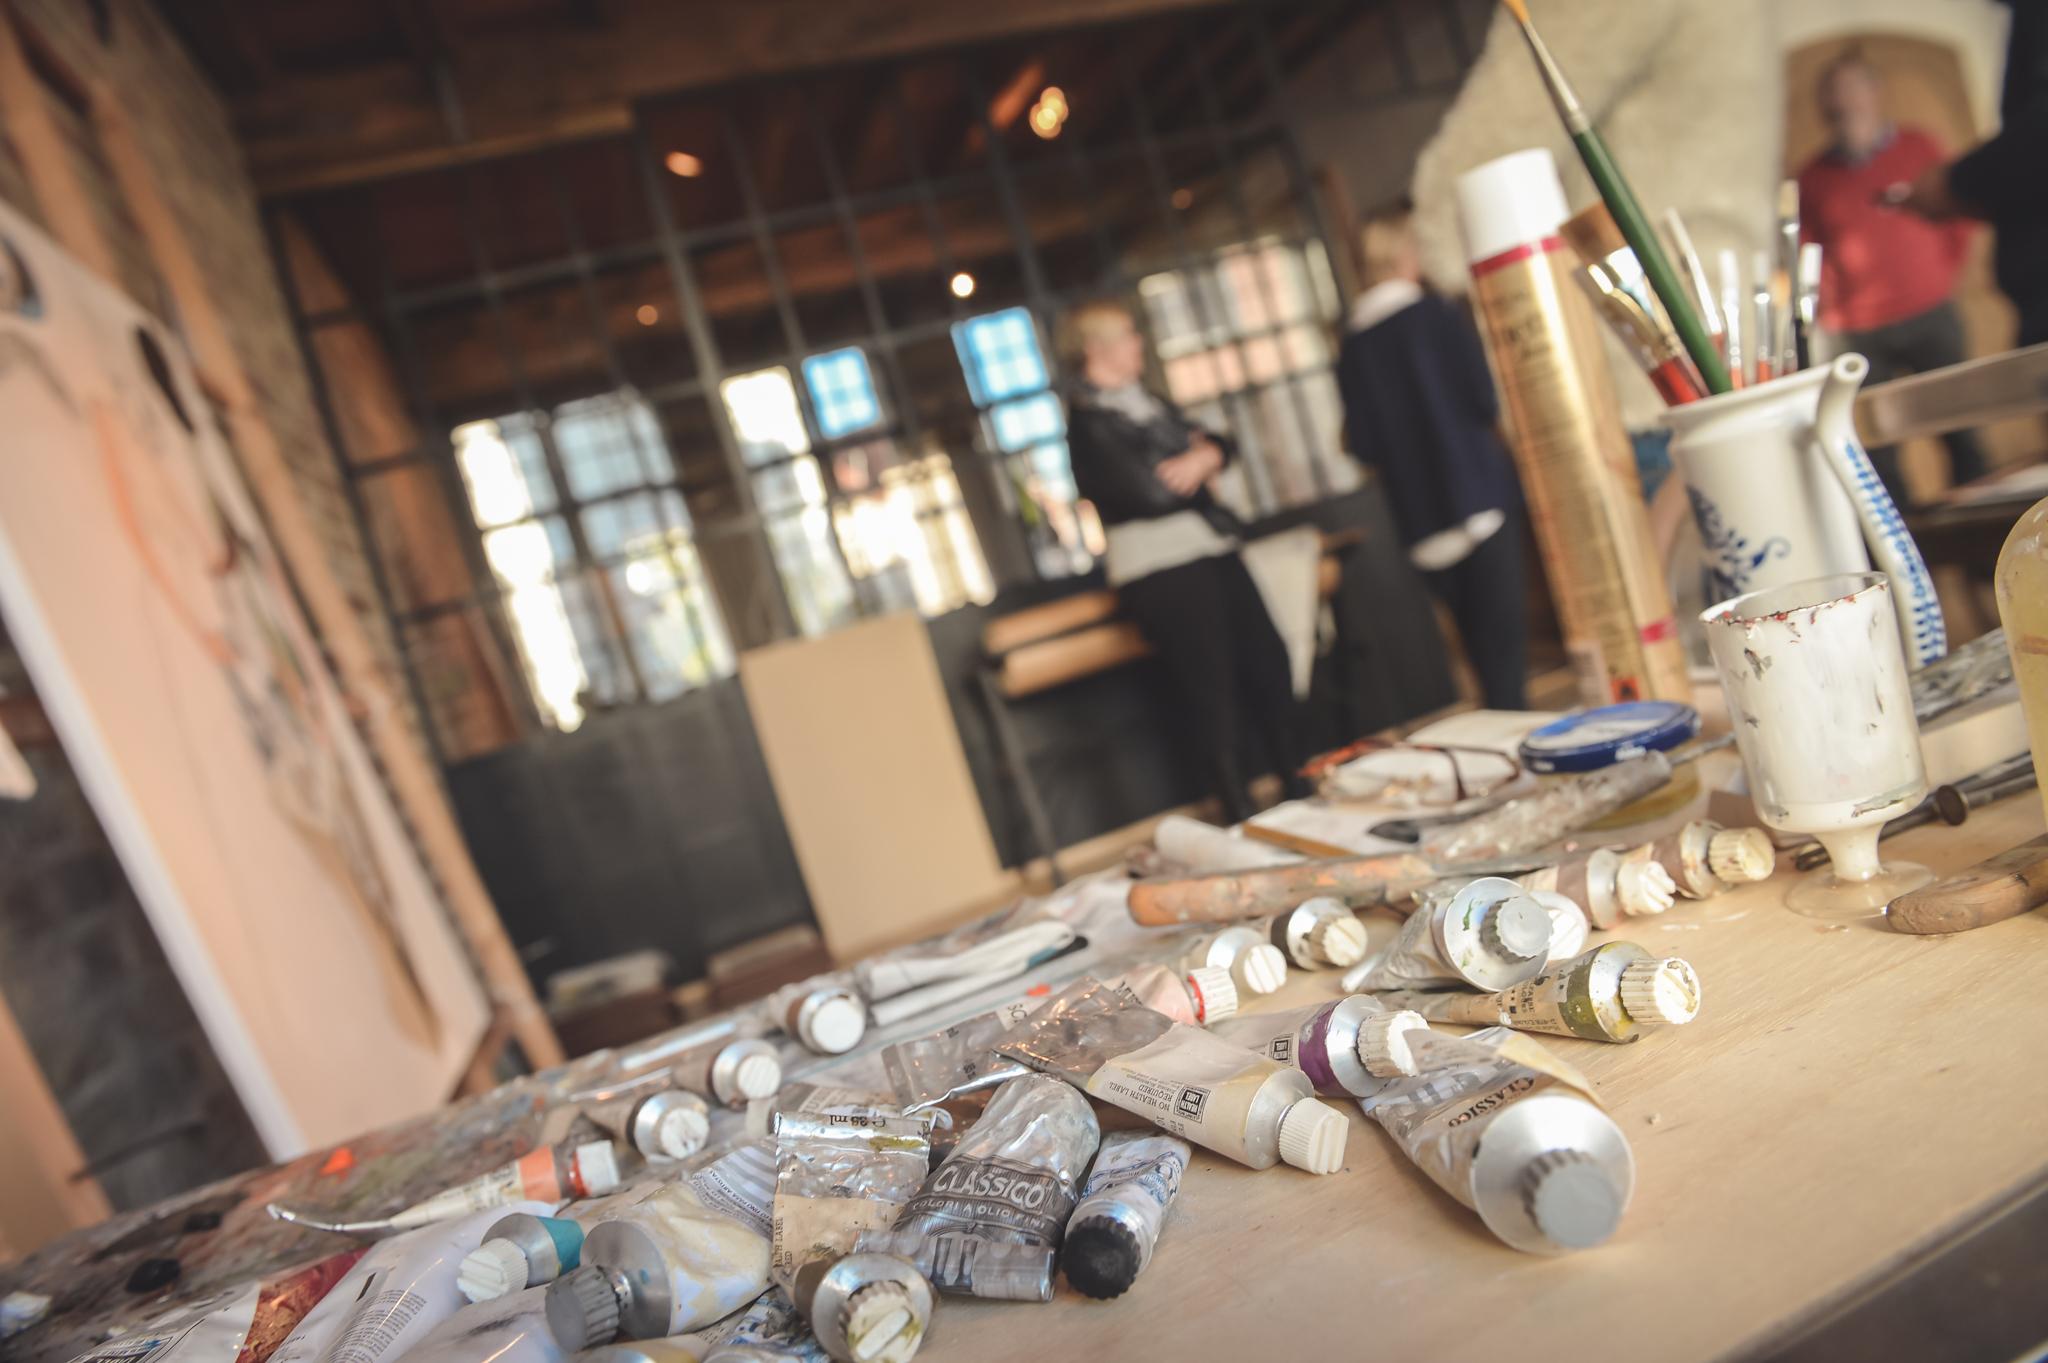 Binnenkijken in brugge detail true by geoffrey van hulle - Eigentijdse high end tapijten ...